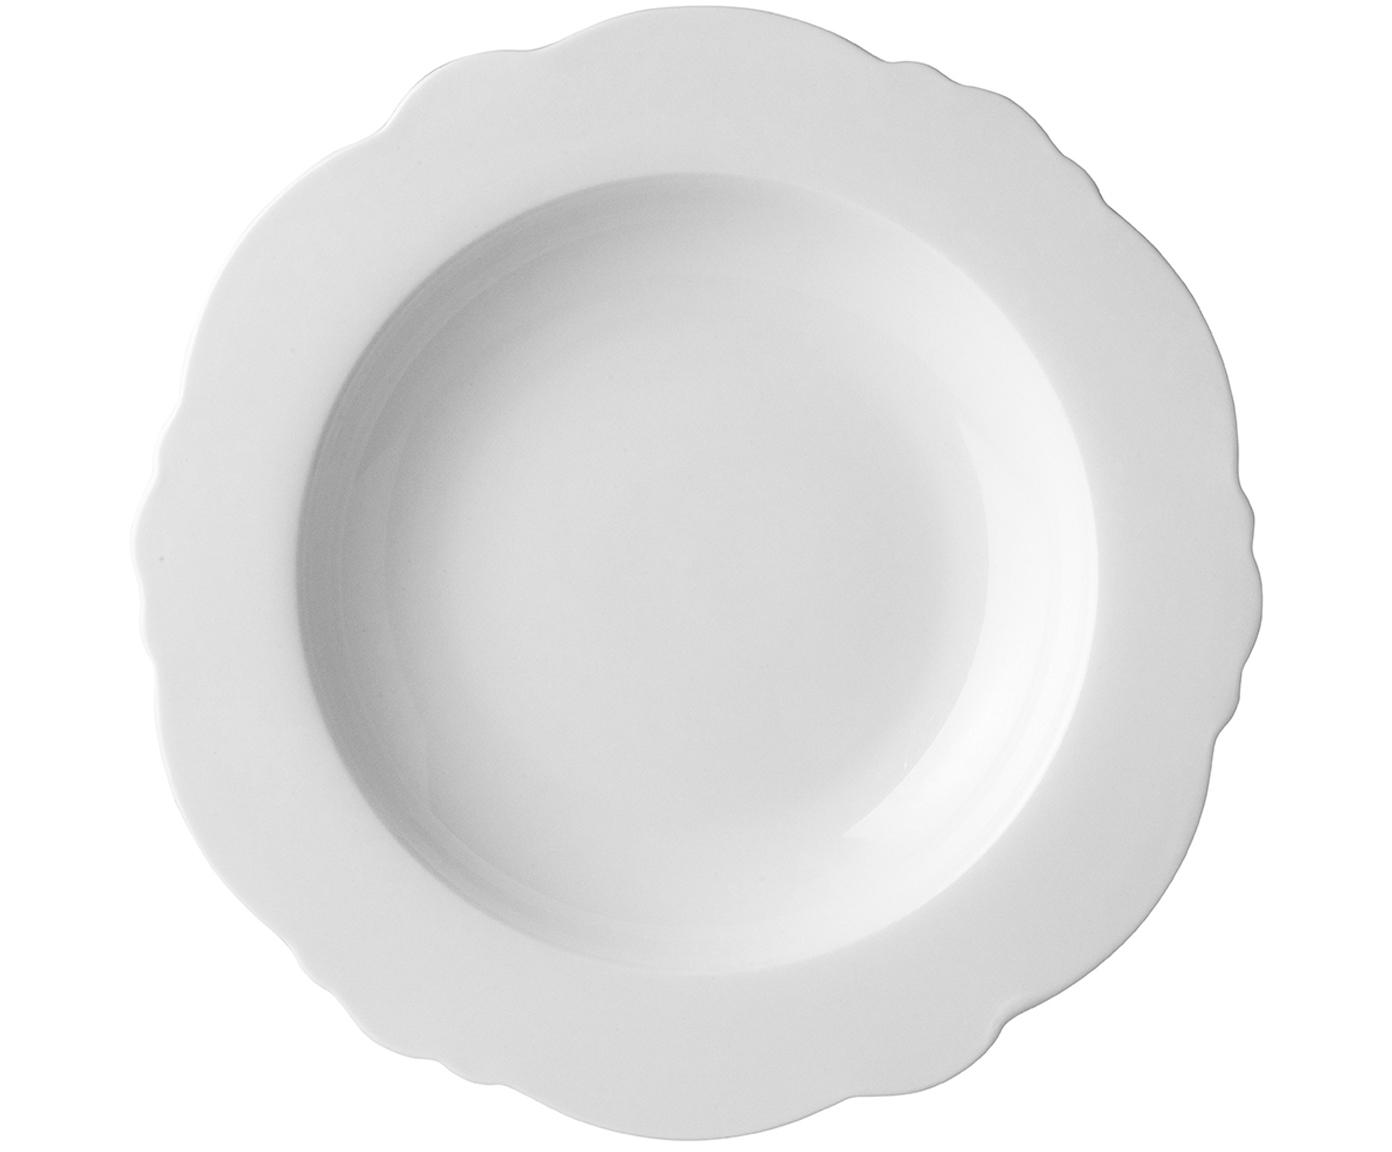 Soepborden Muschel Loft, 4 stuks, Porselein, Wit, Ø 23 x H 3 cm